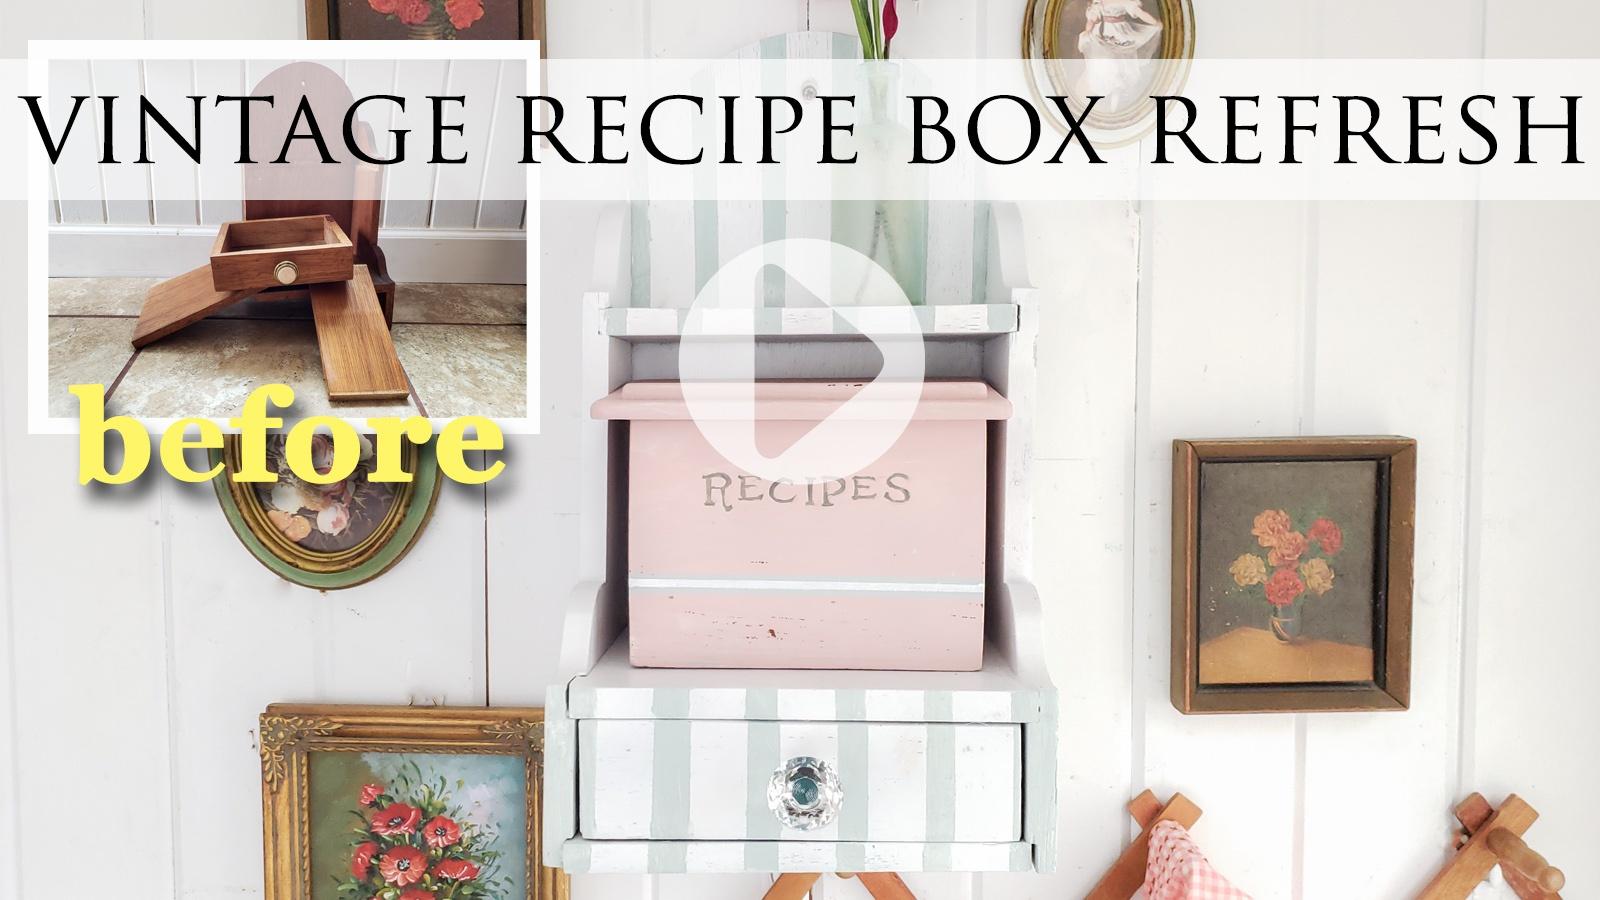 DIY Recipe Box Makeover Video Tutorial by Larissa of Prodigal Pieces | prodigalpieces.com #prodigalpieces